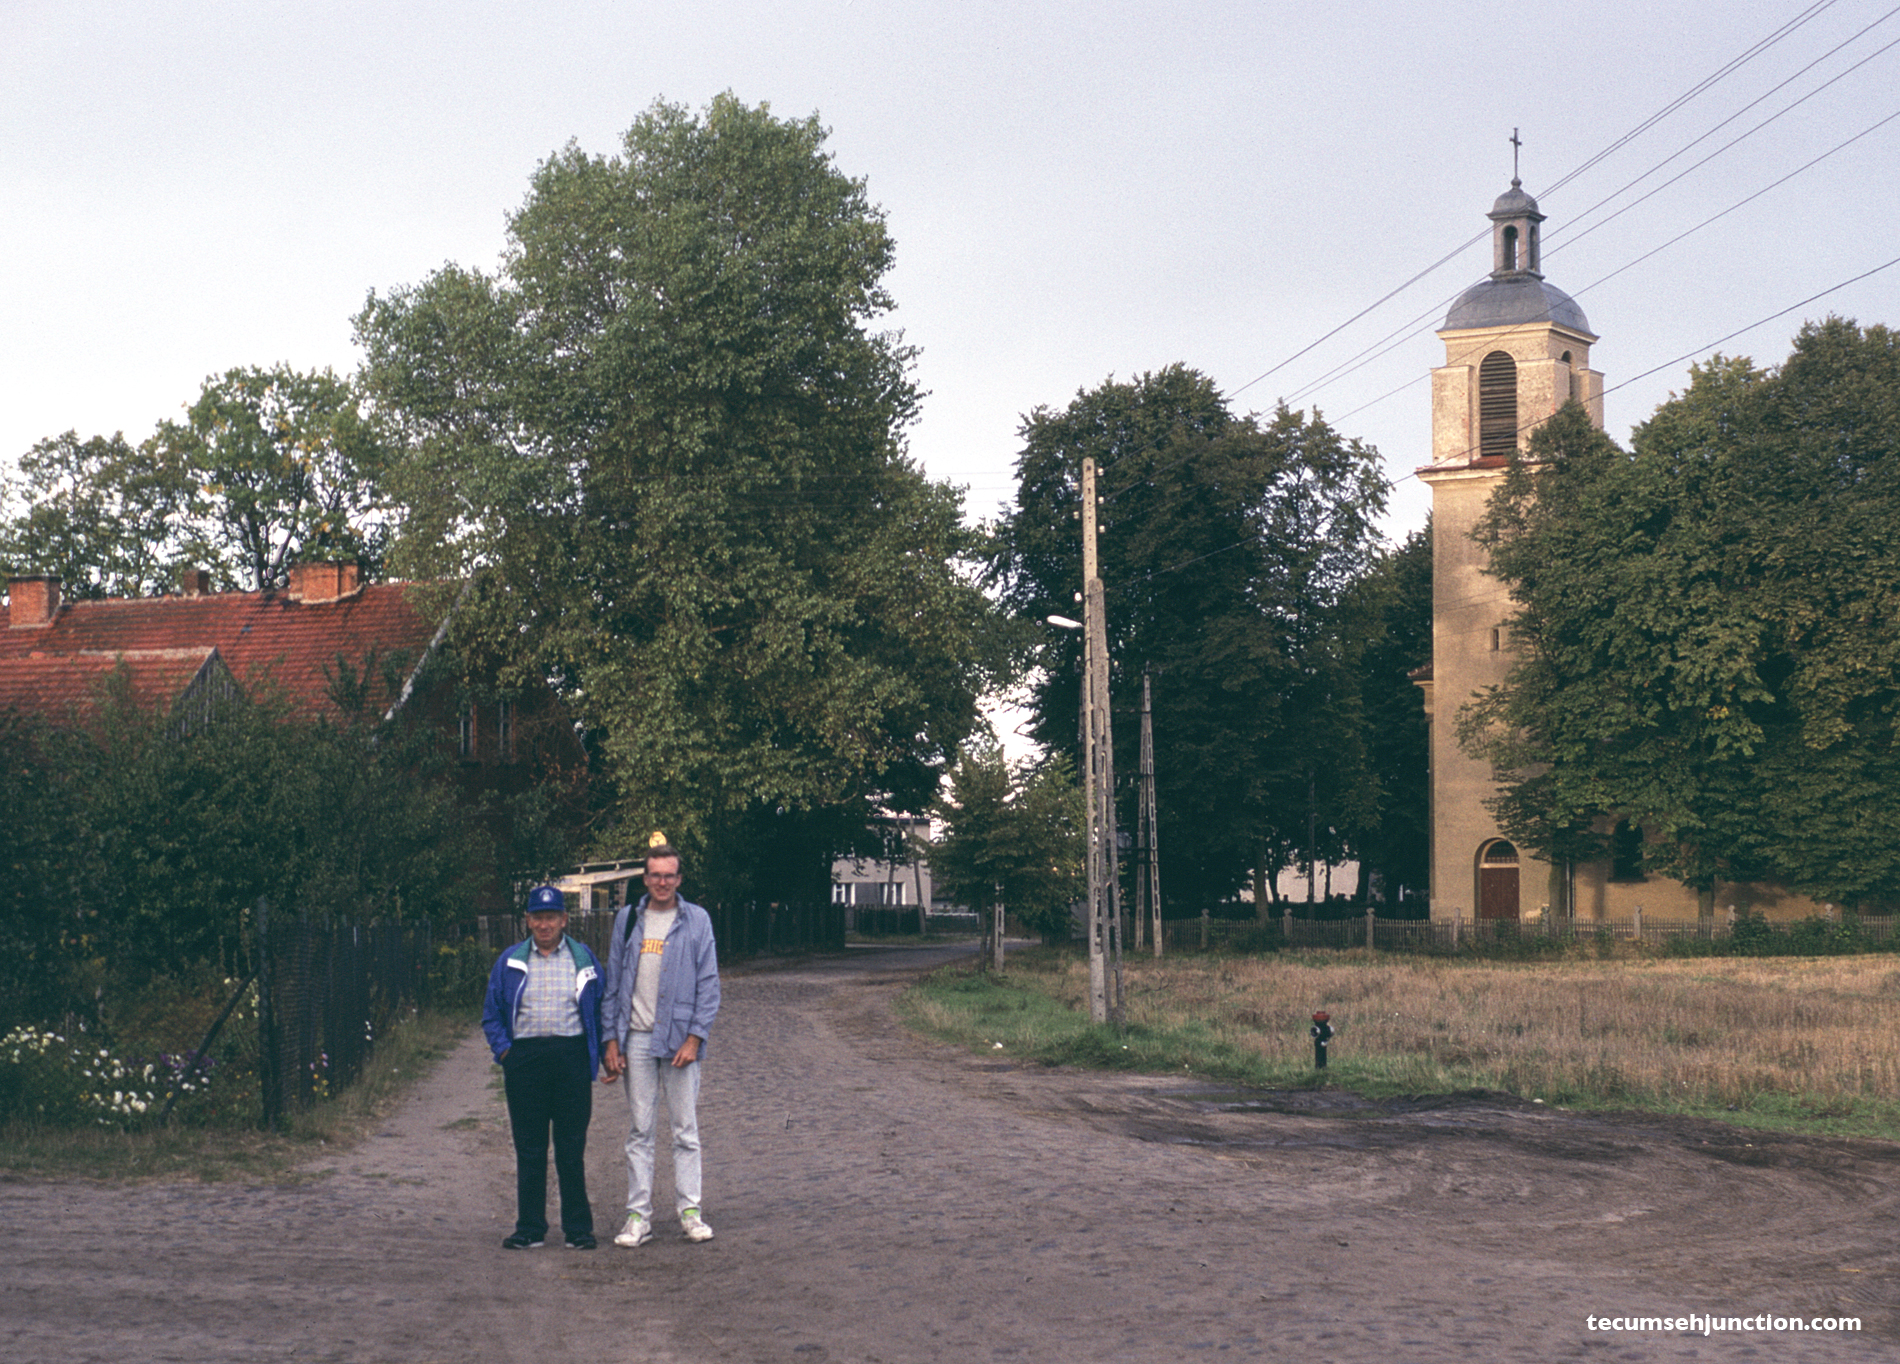 Stanley and Jeffrey Dobek at Odry, Poland